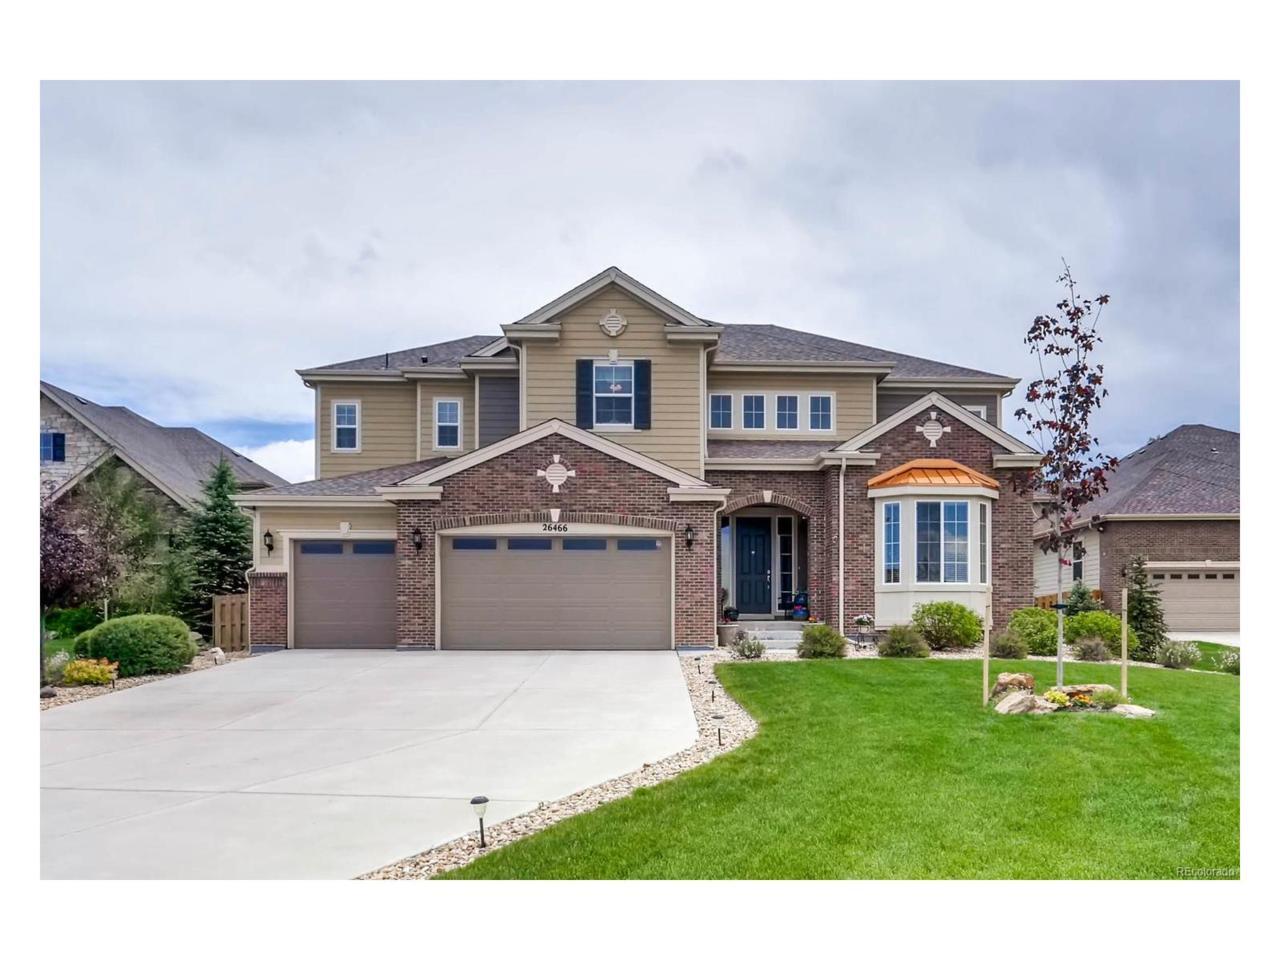 26466 E Peakview Drive, Aurora, CO 80016 (MLS #2694828) :: 8z Real Estate